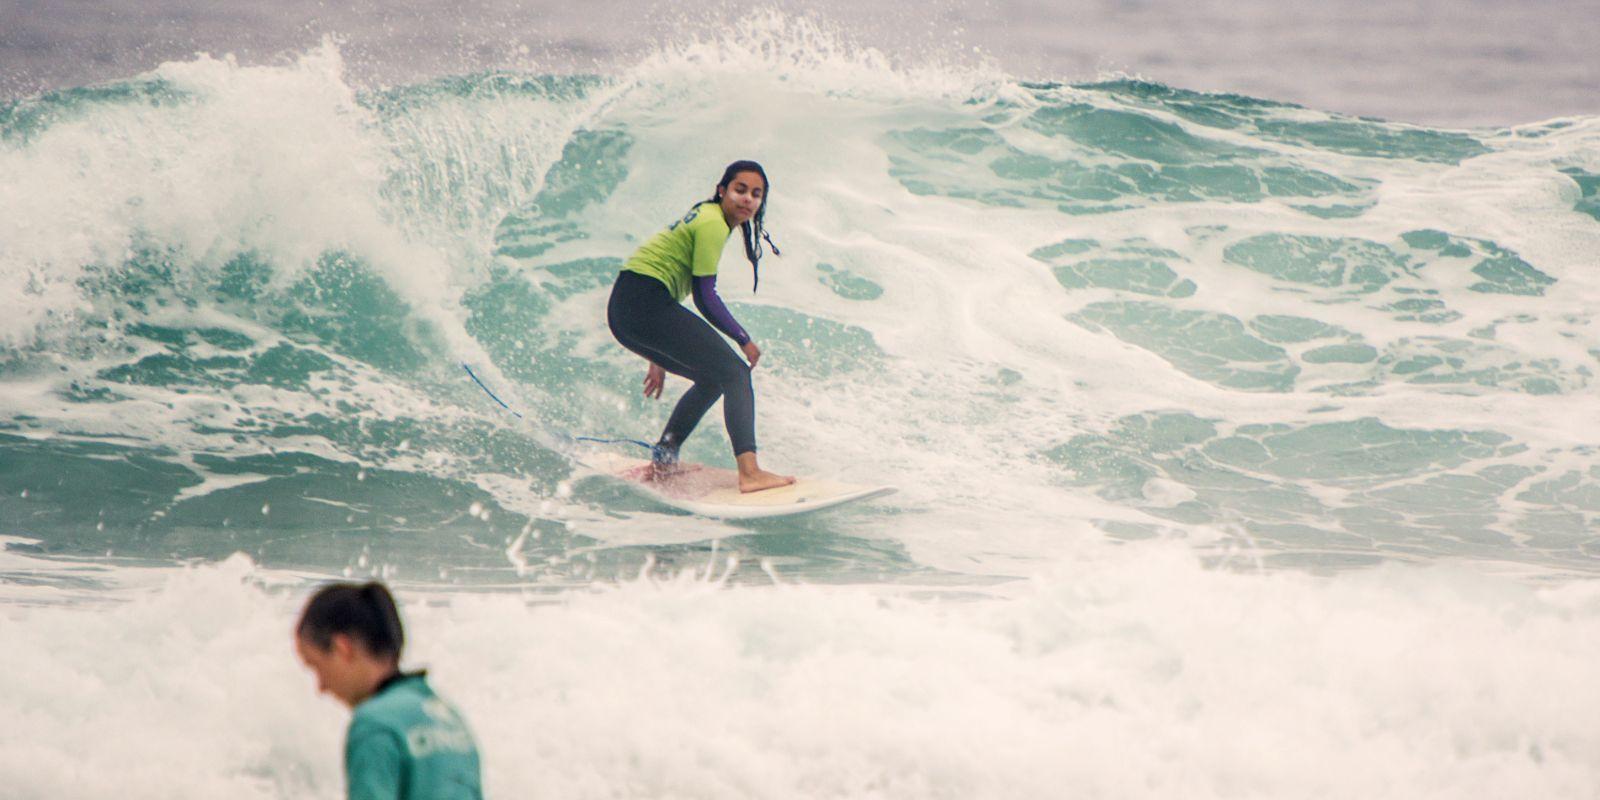 Alumna juvenil cogiendo olas en Sanvi